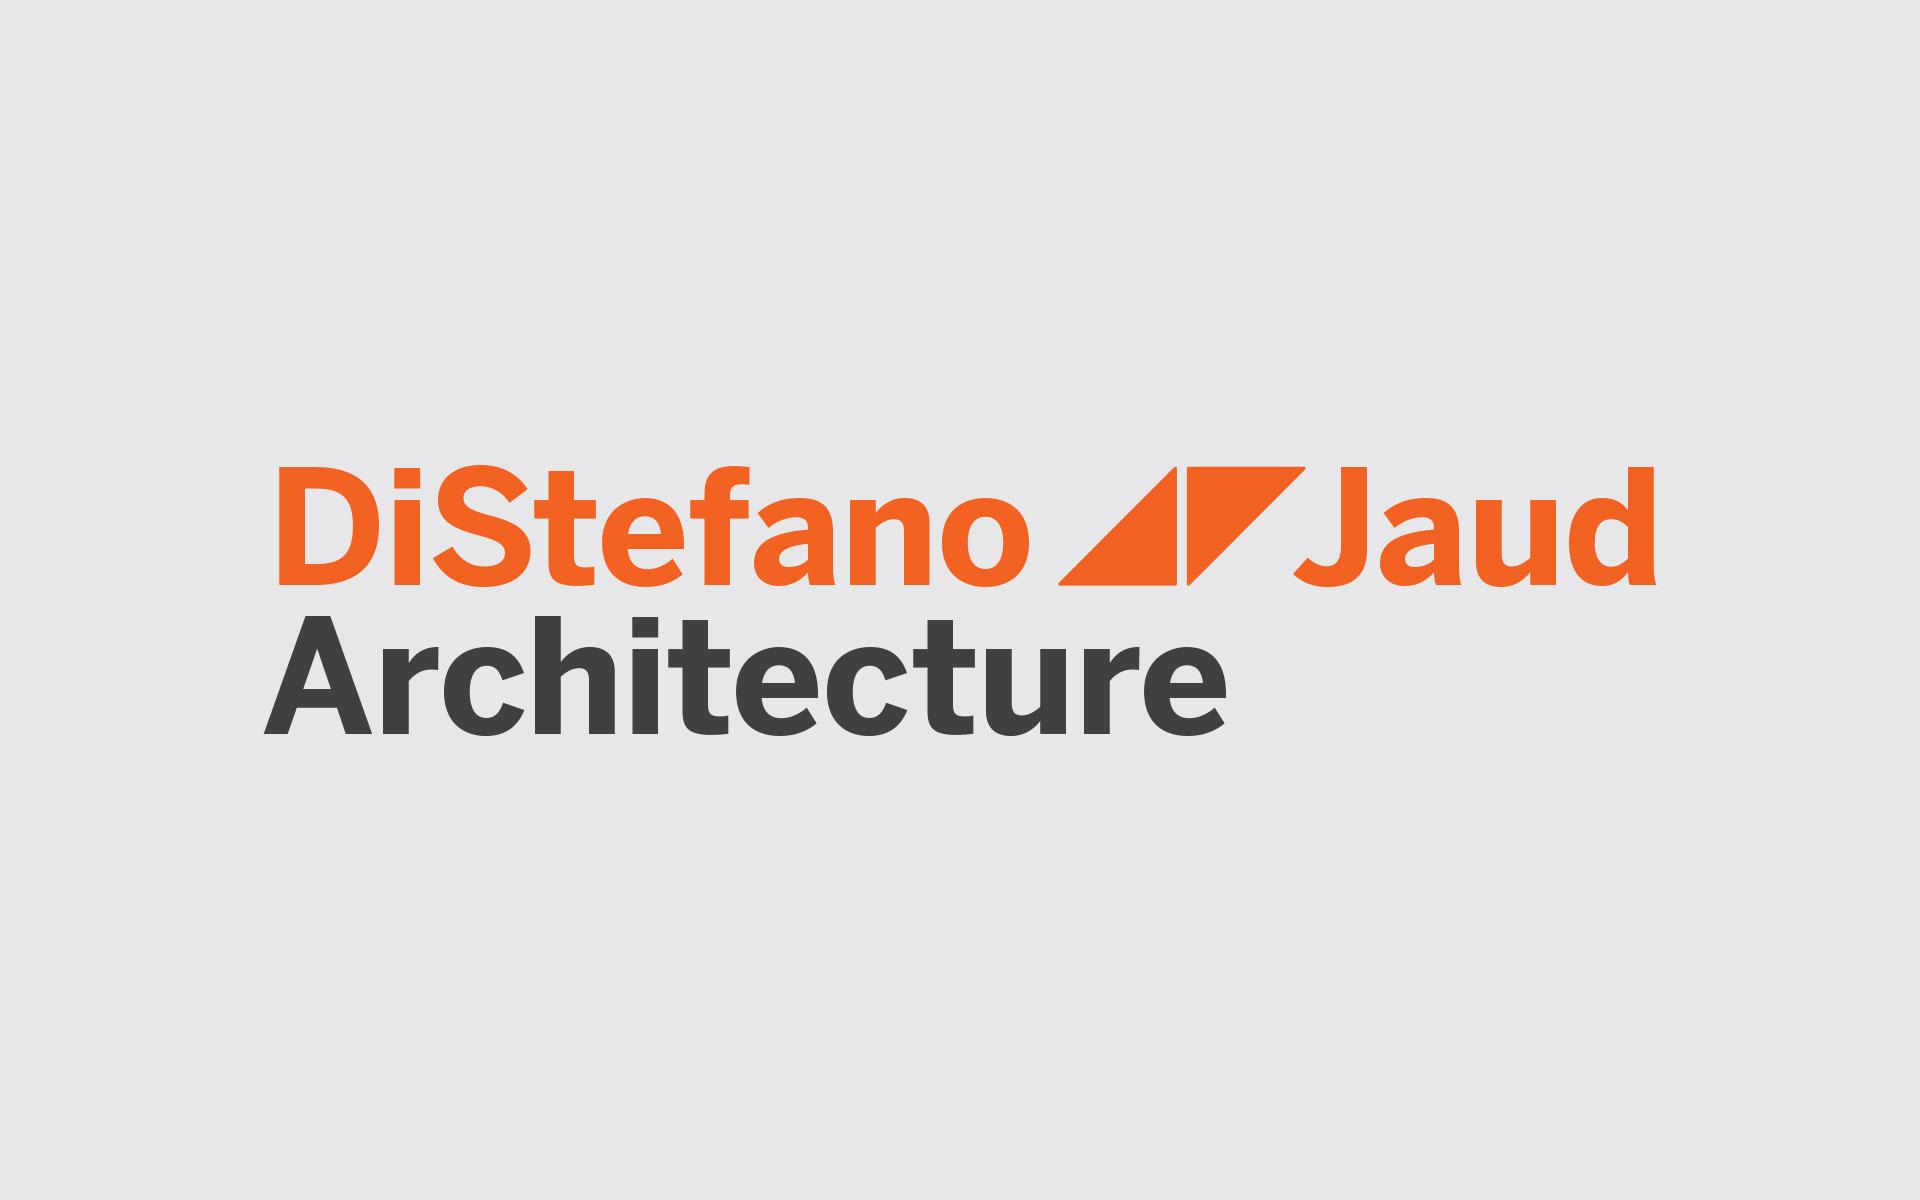 DiStefano Jaud Architecture logotype design